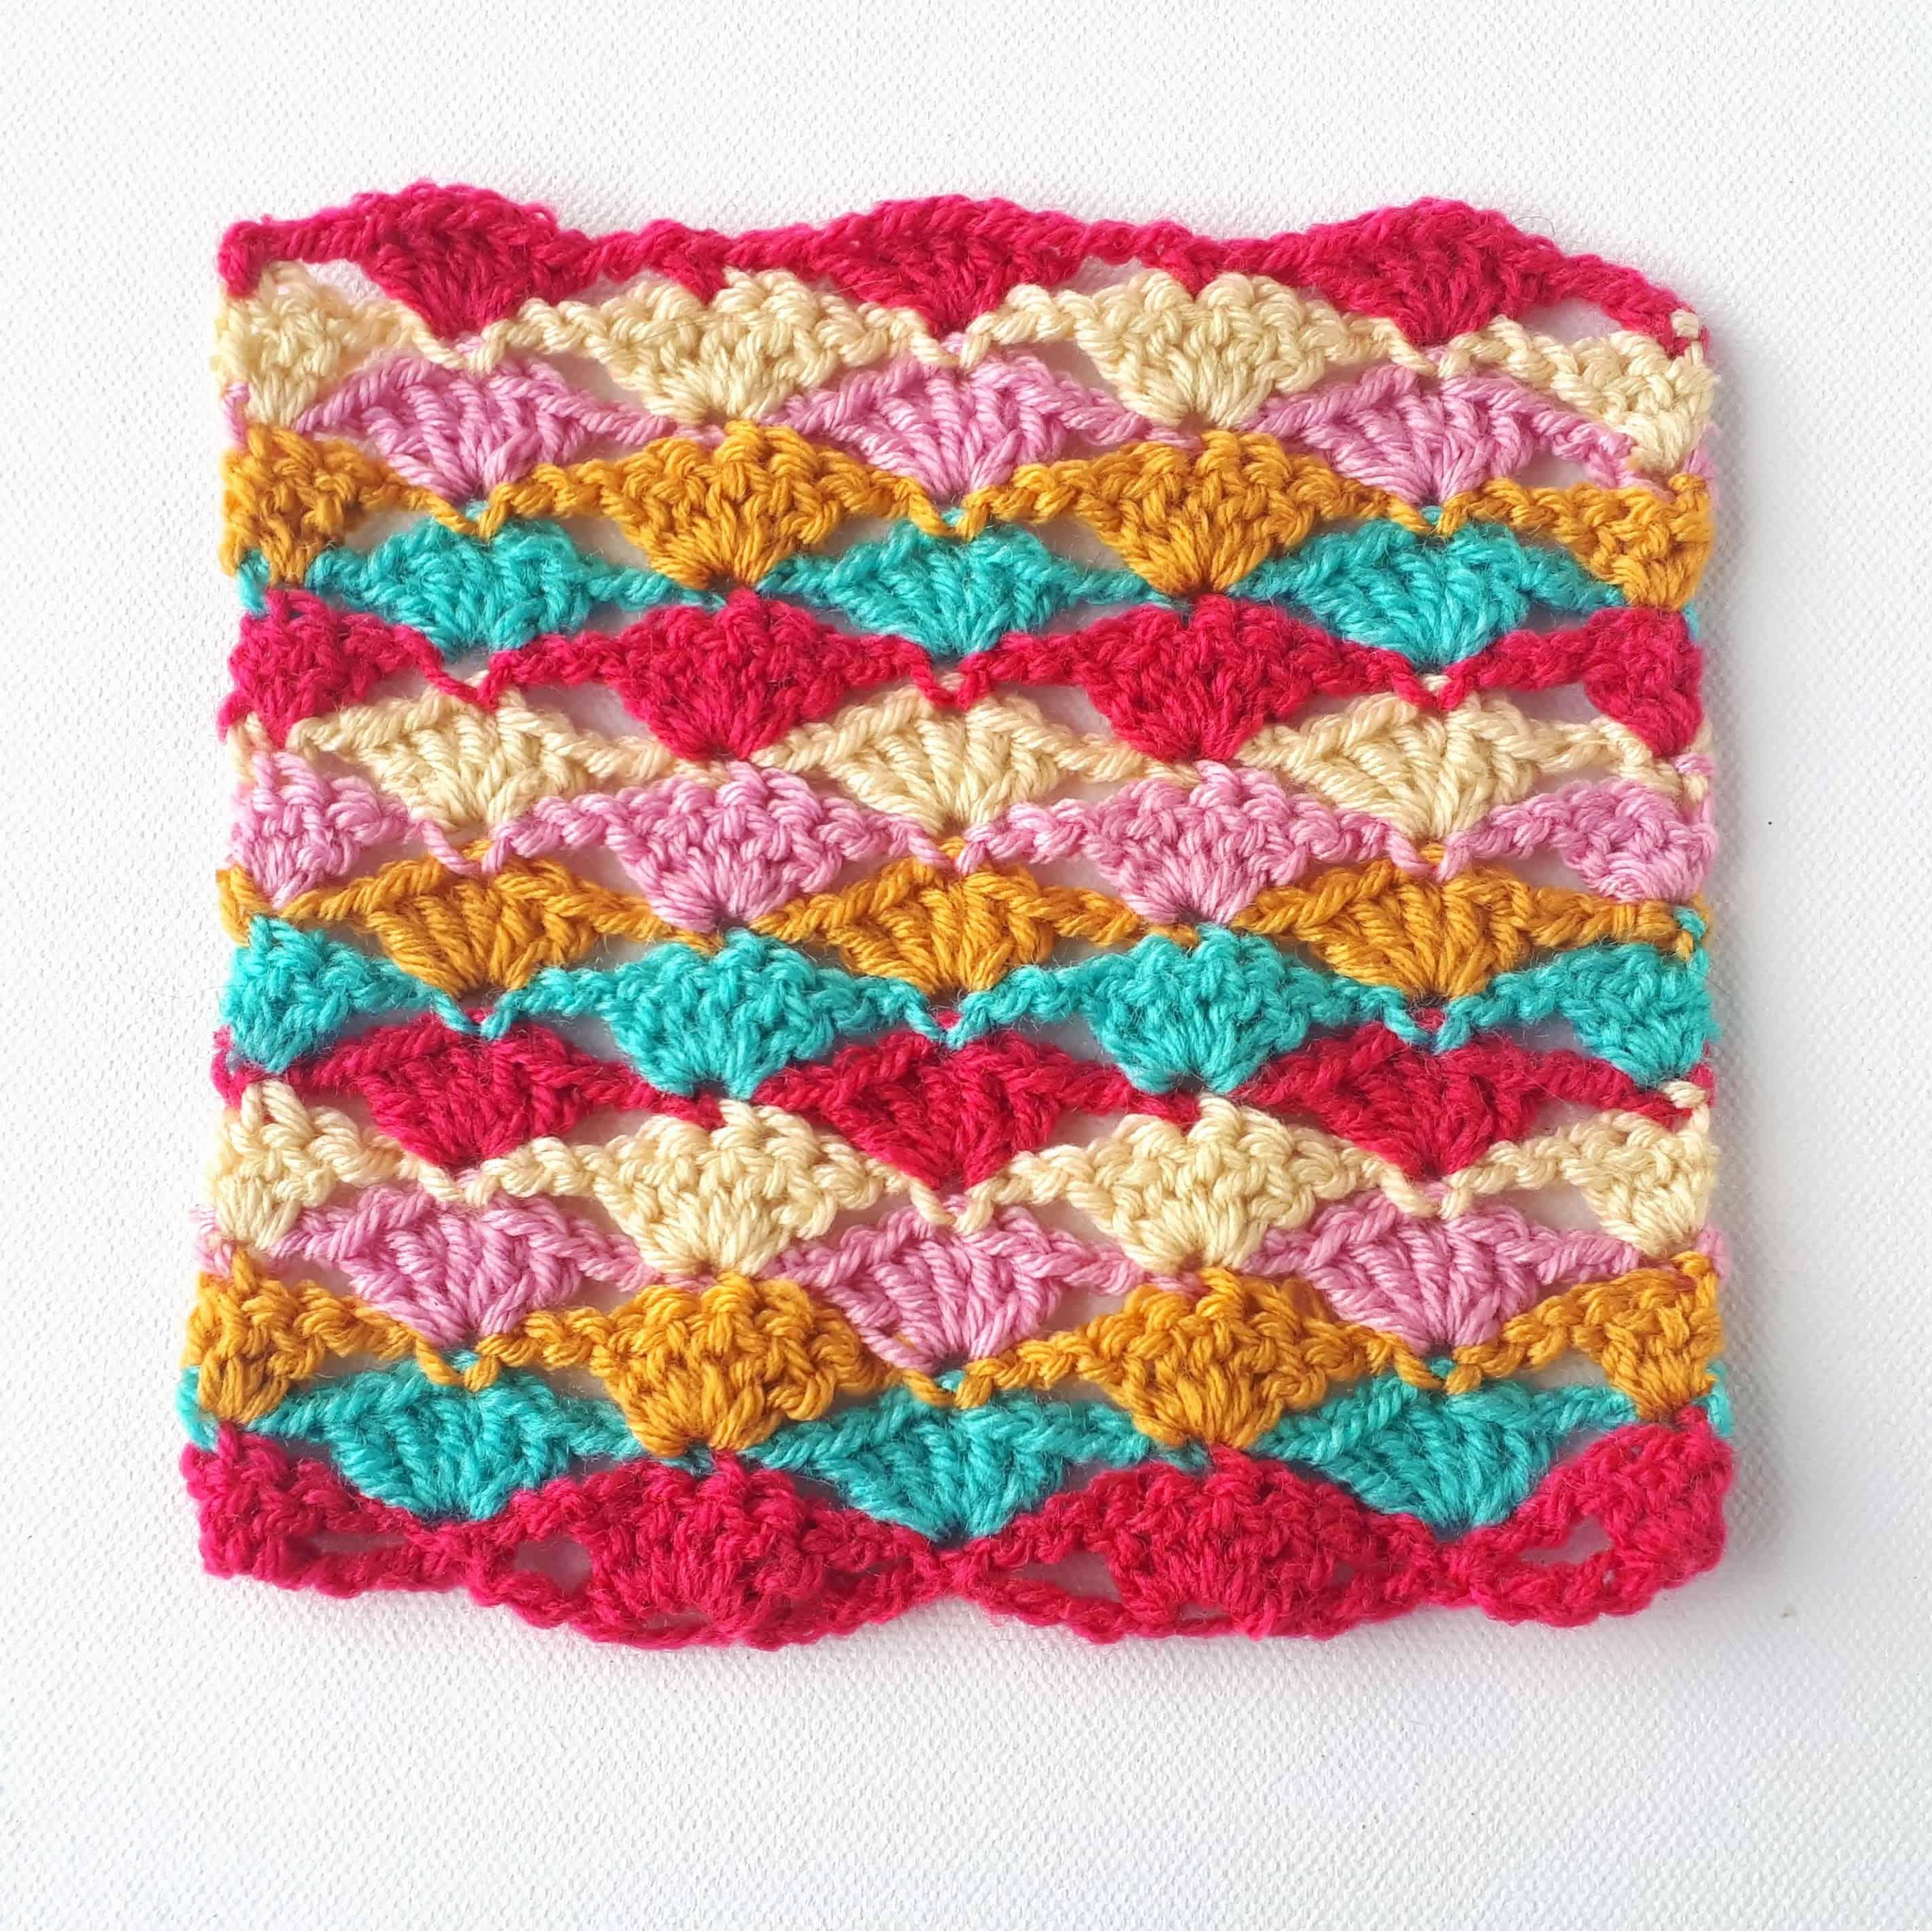 How To Crochet Lace Fan Stitch Annie Design Crochet